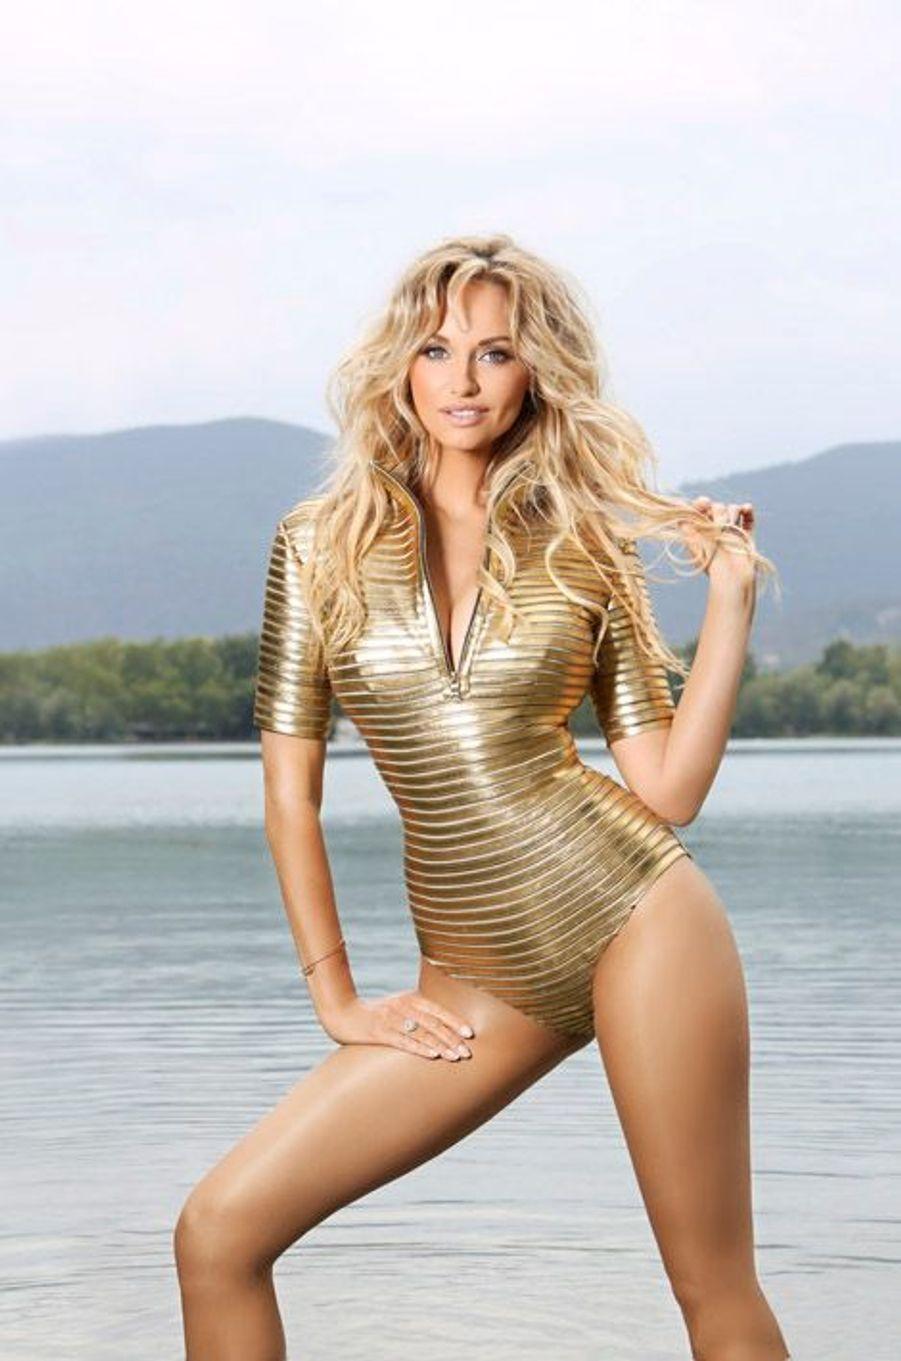 Attitude sexy d'Adriana KAREMBEU, habillée en Jitrois, au lac de Banyoles.